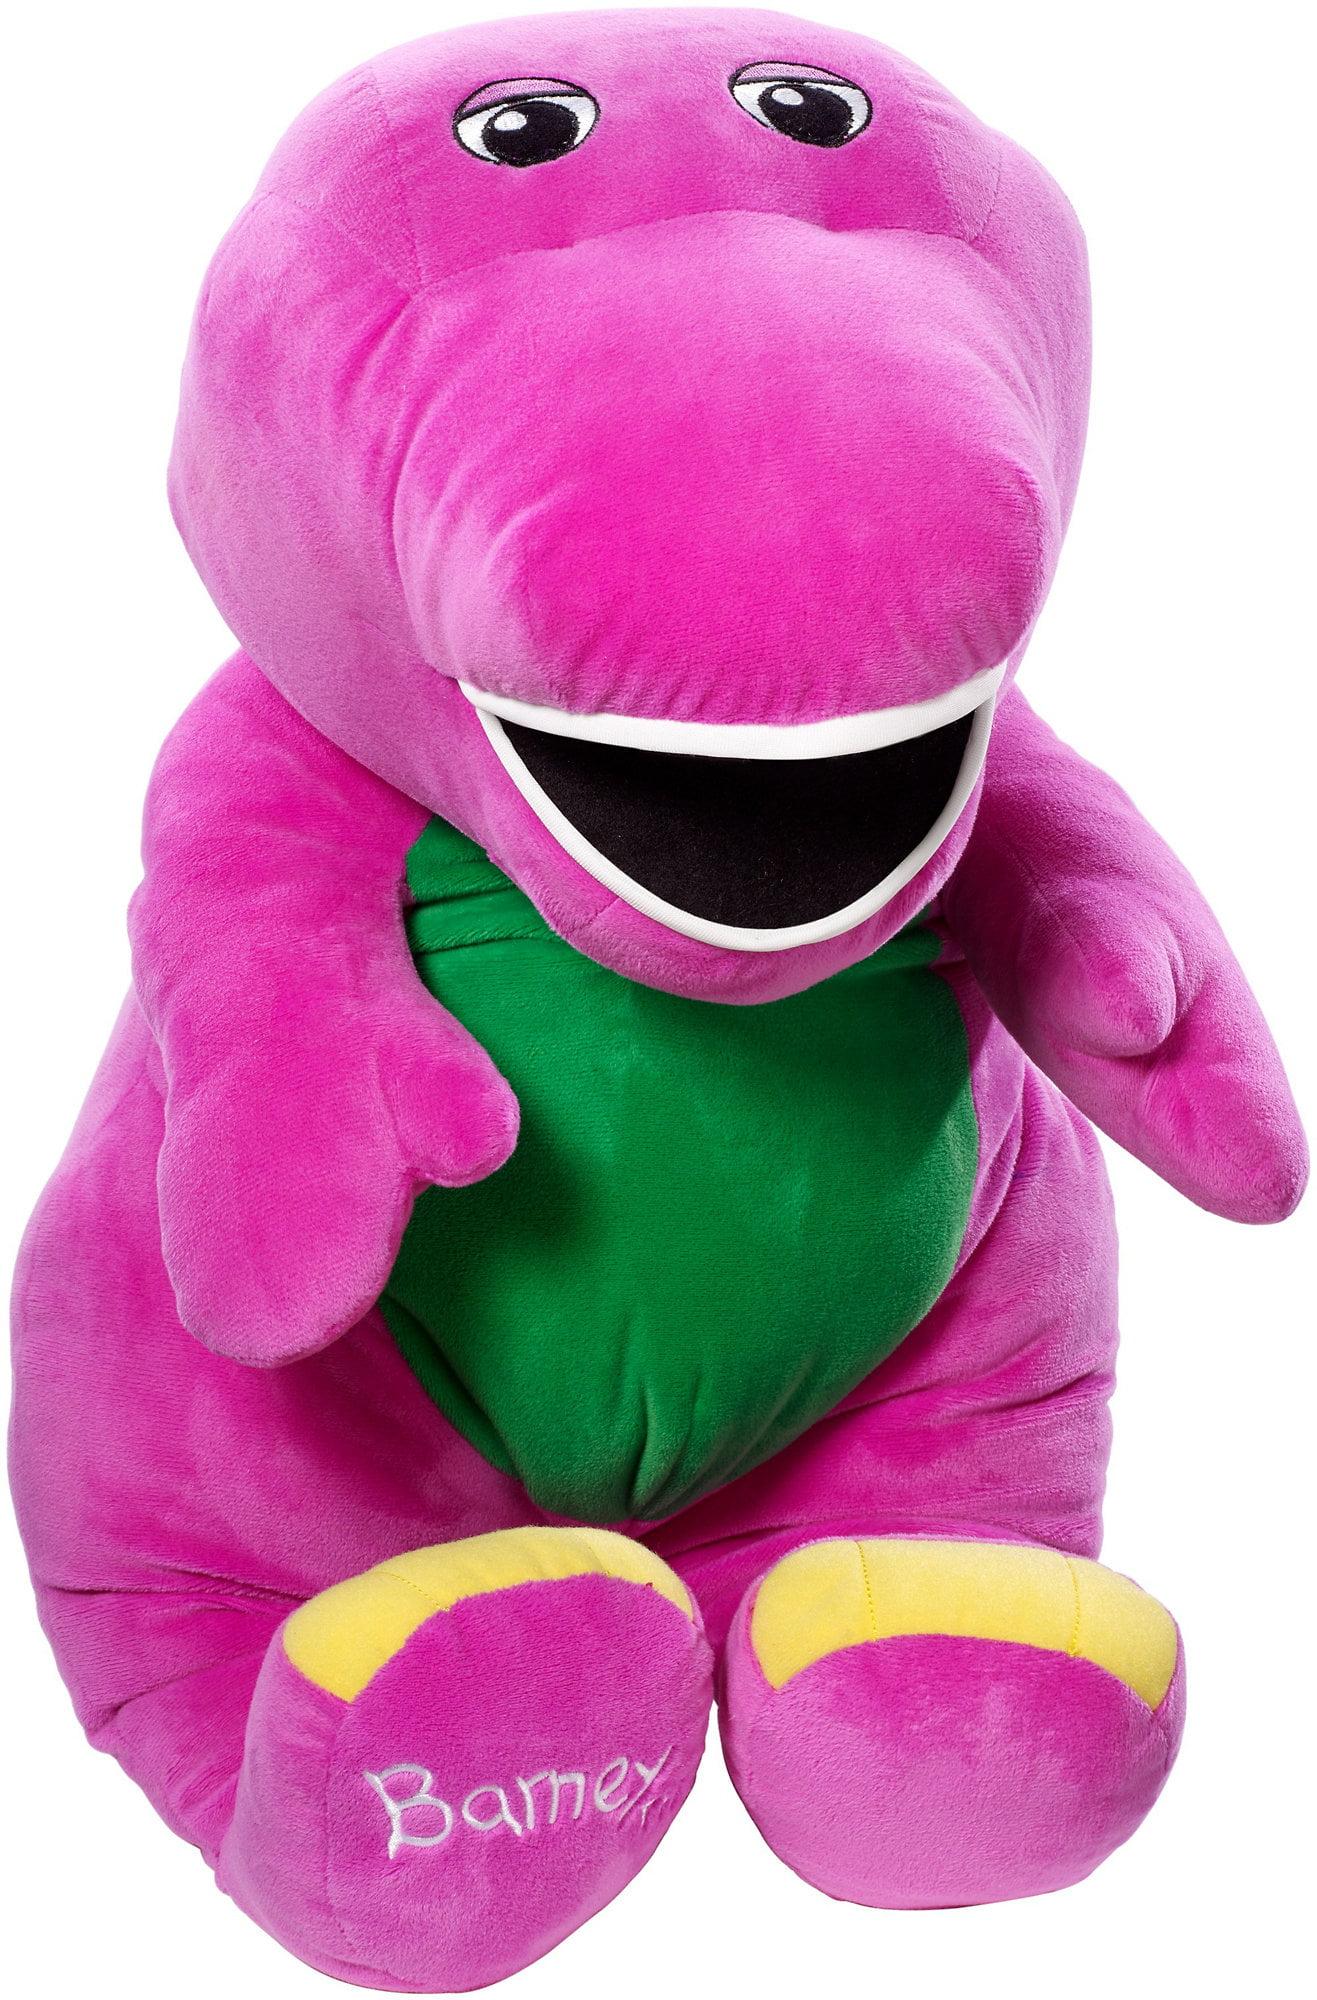 Speak 'n Sing Jumbo Barney The Purple Dinosaur Plush Figure by Generic